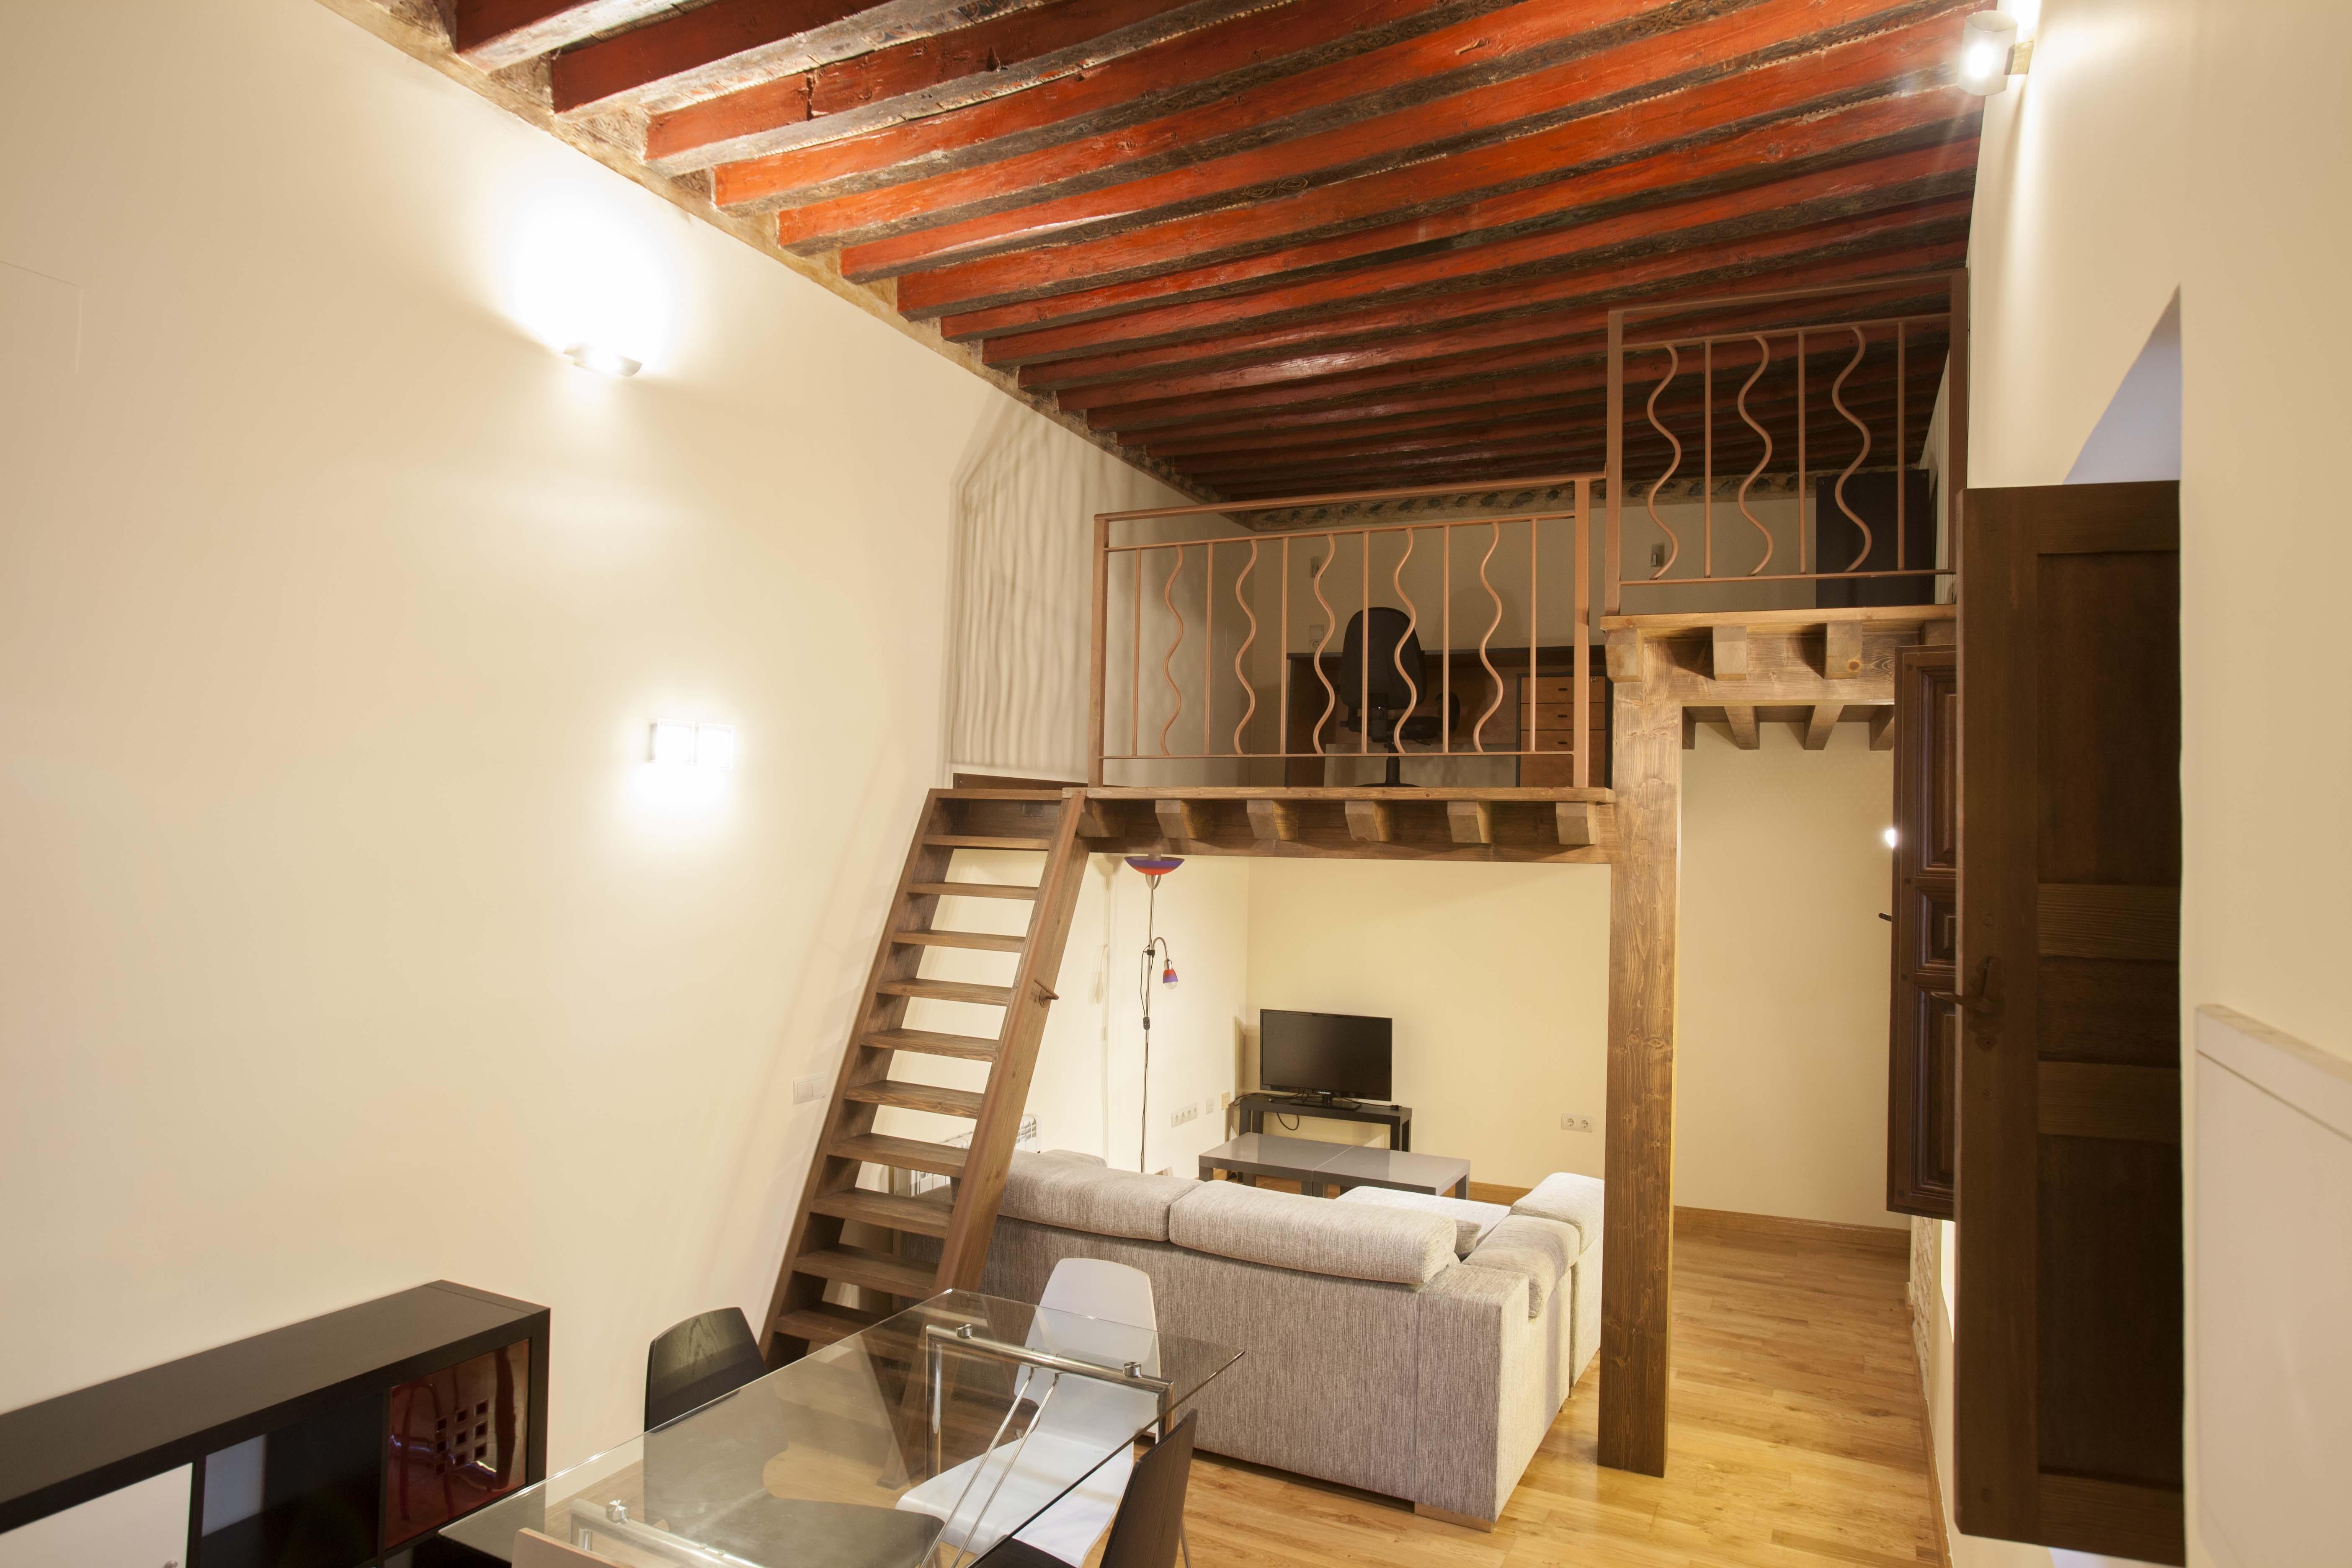 C/ Silleria (Casco Histórico)